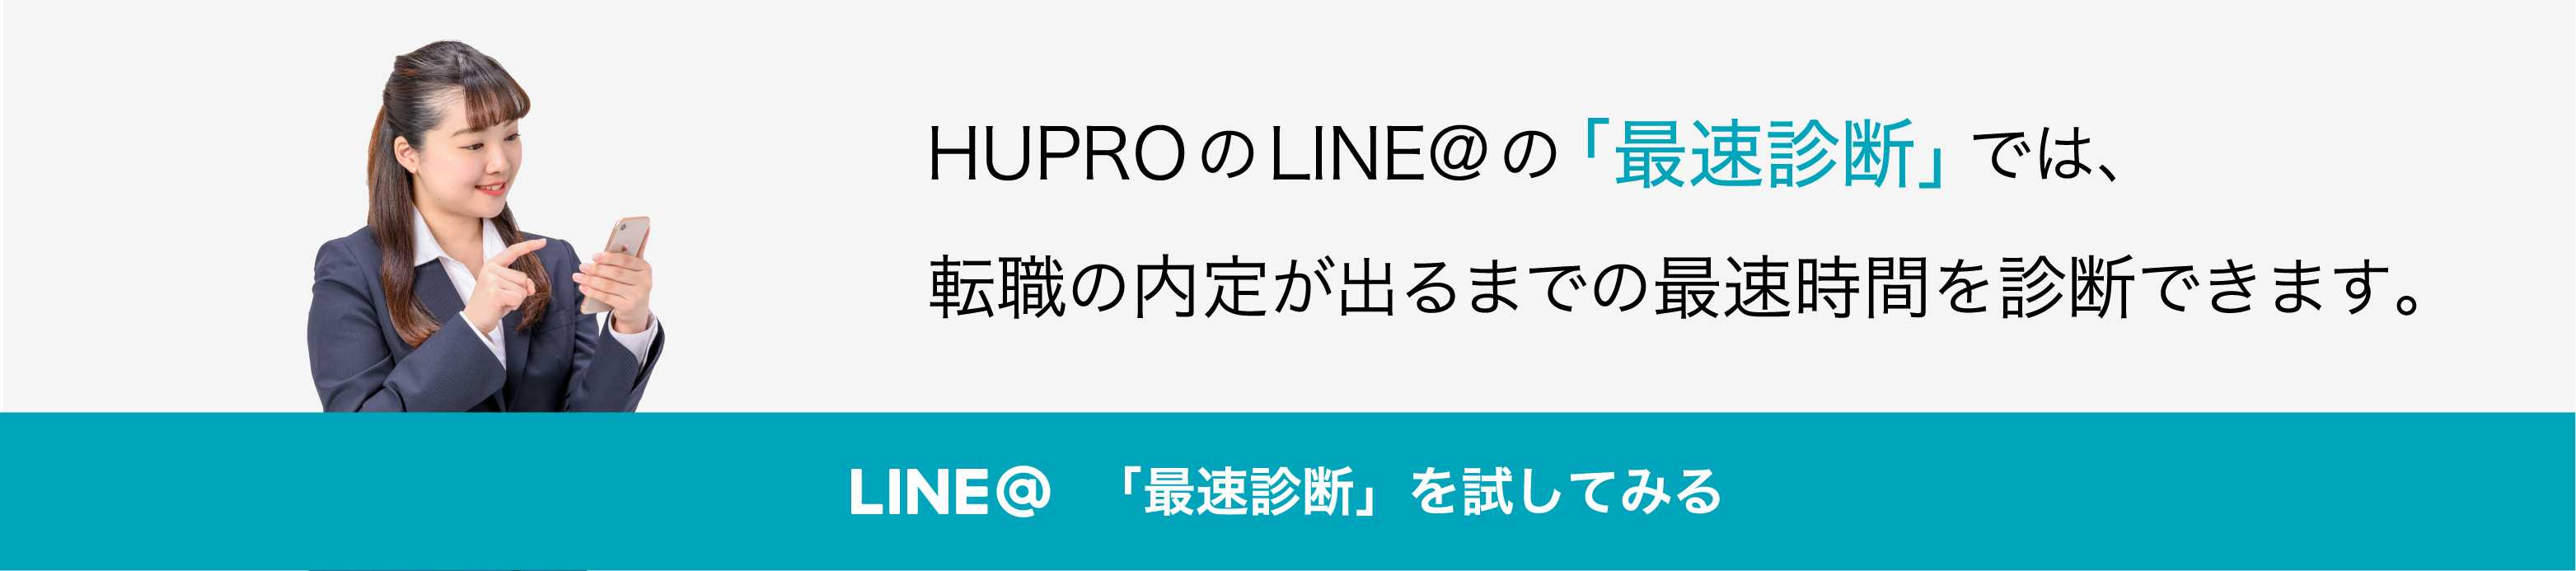 Line banner pc